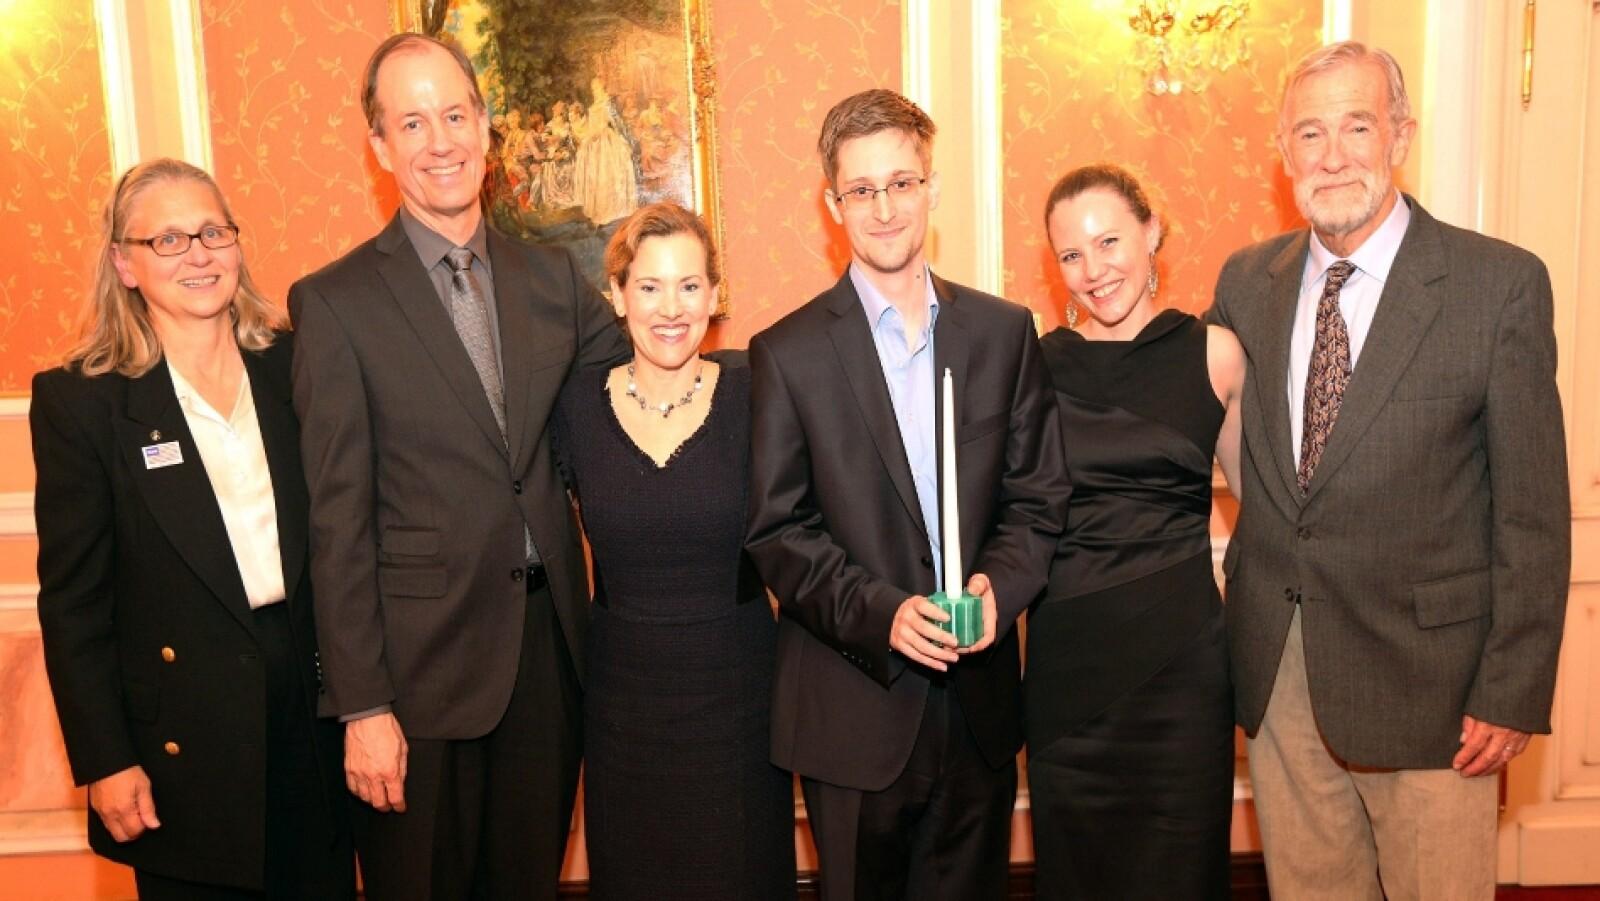 snowden sam adams awards getty